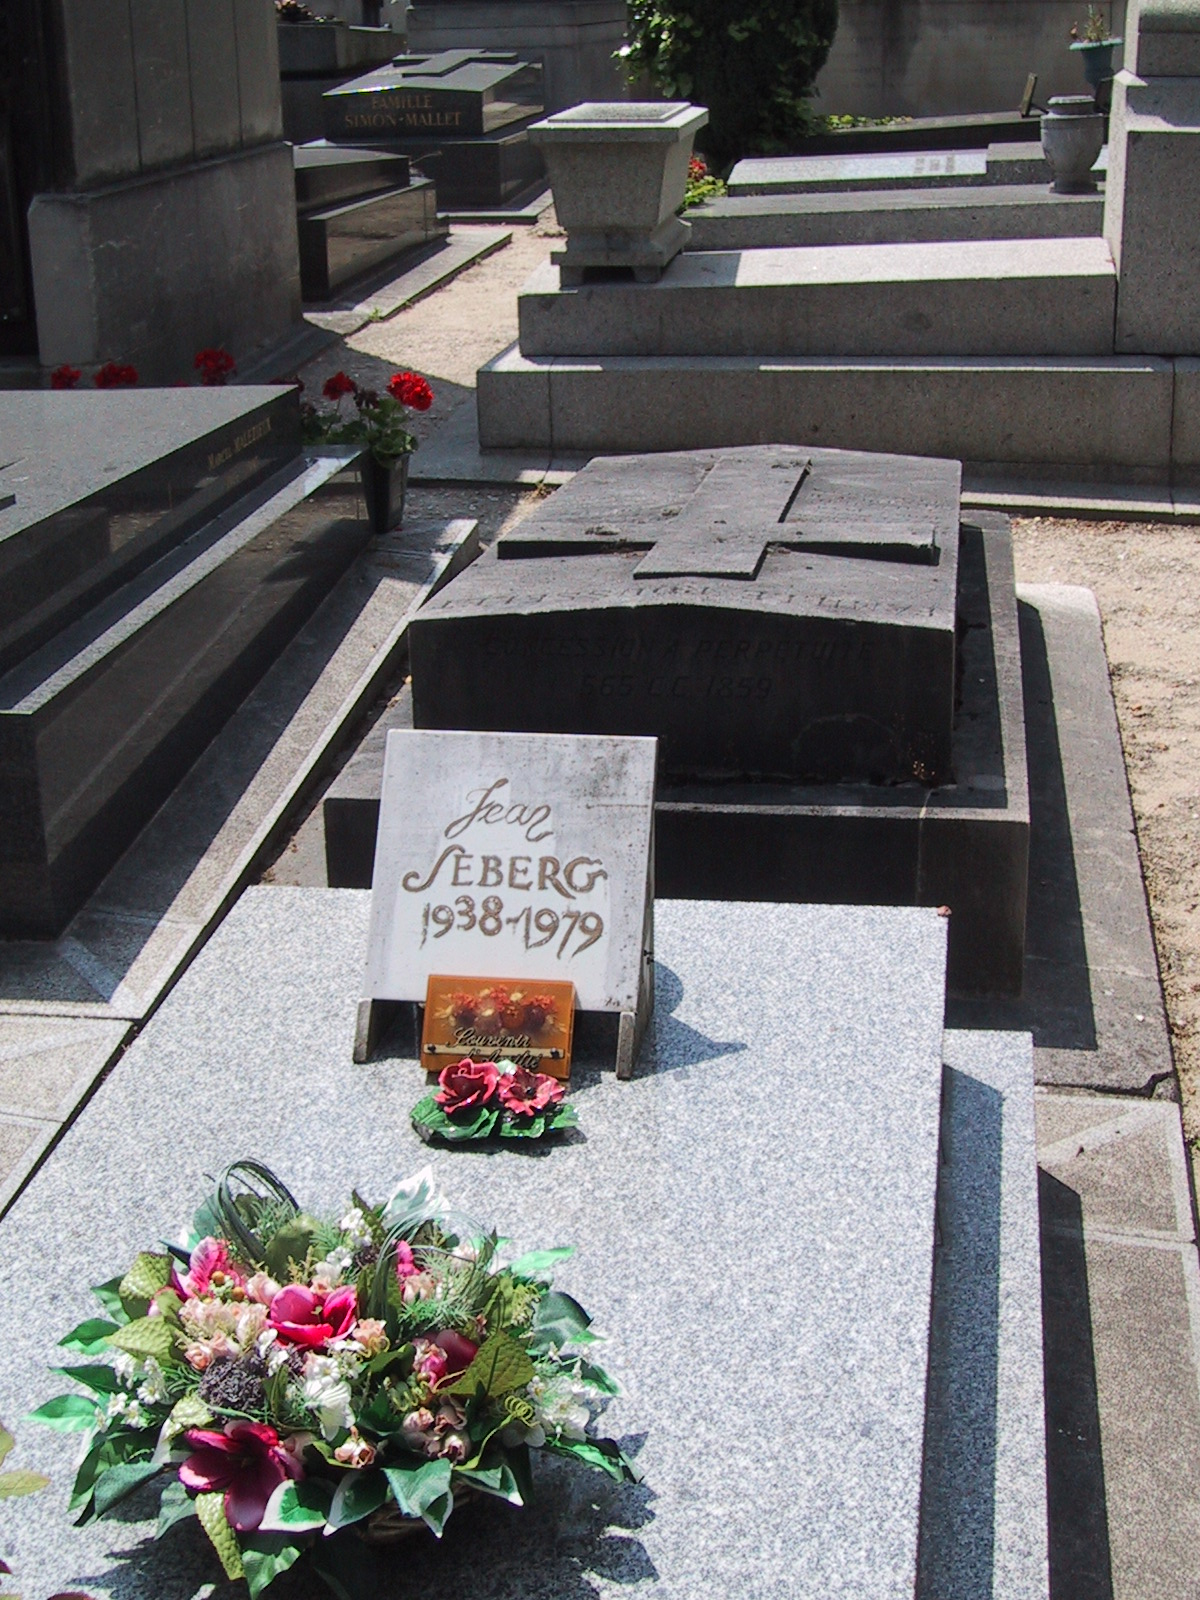 Jean Seberg grave Paris Montparnasse